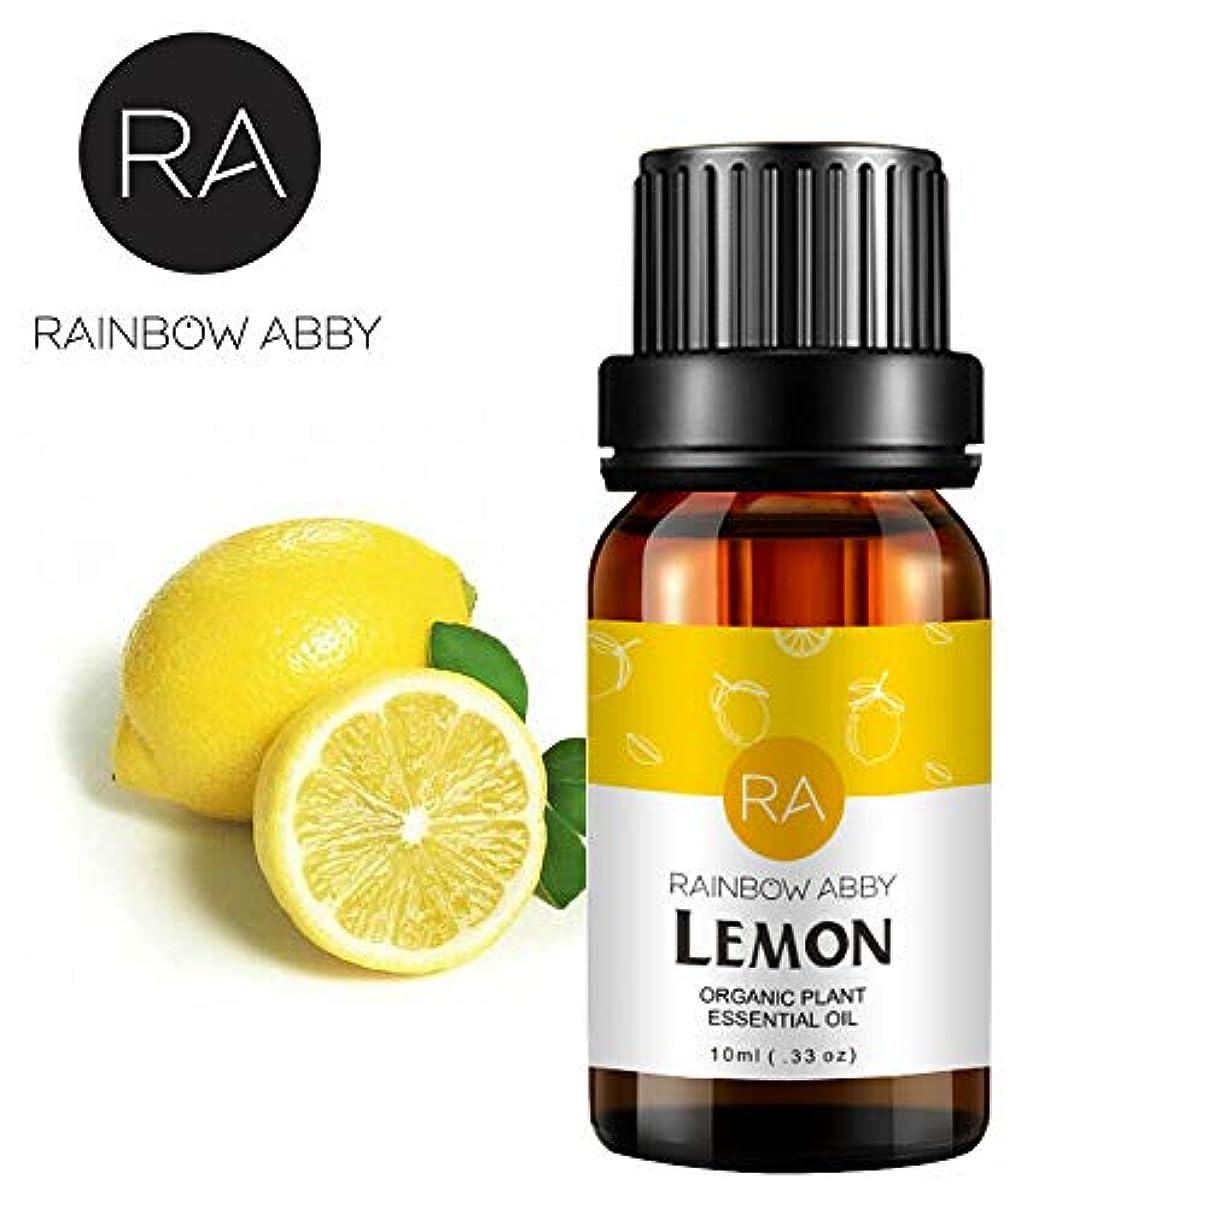 RAINBOW ABBY レモンエッセンシャル オイル ディフューザー アロマ セラピー オイル 100% ピュアオーガニック 植物 エキスレモン オイル 10ML/0.33oz